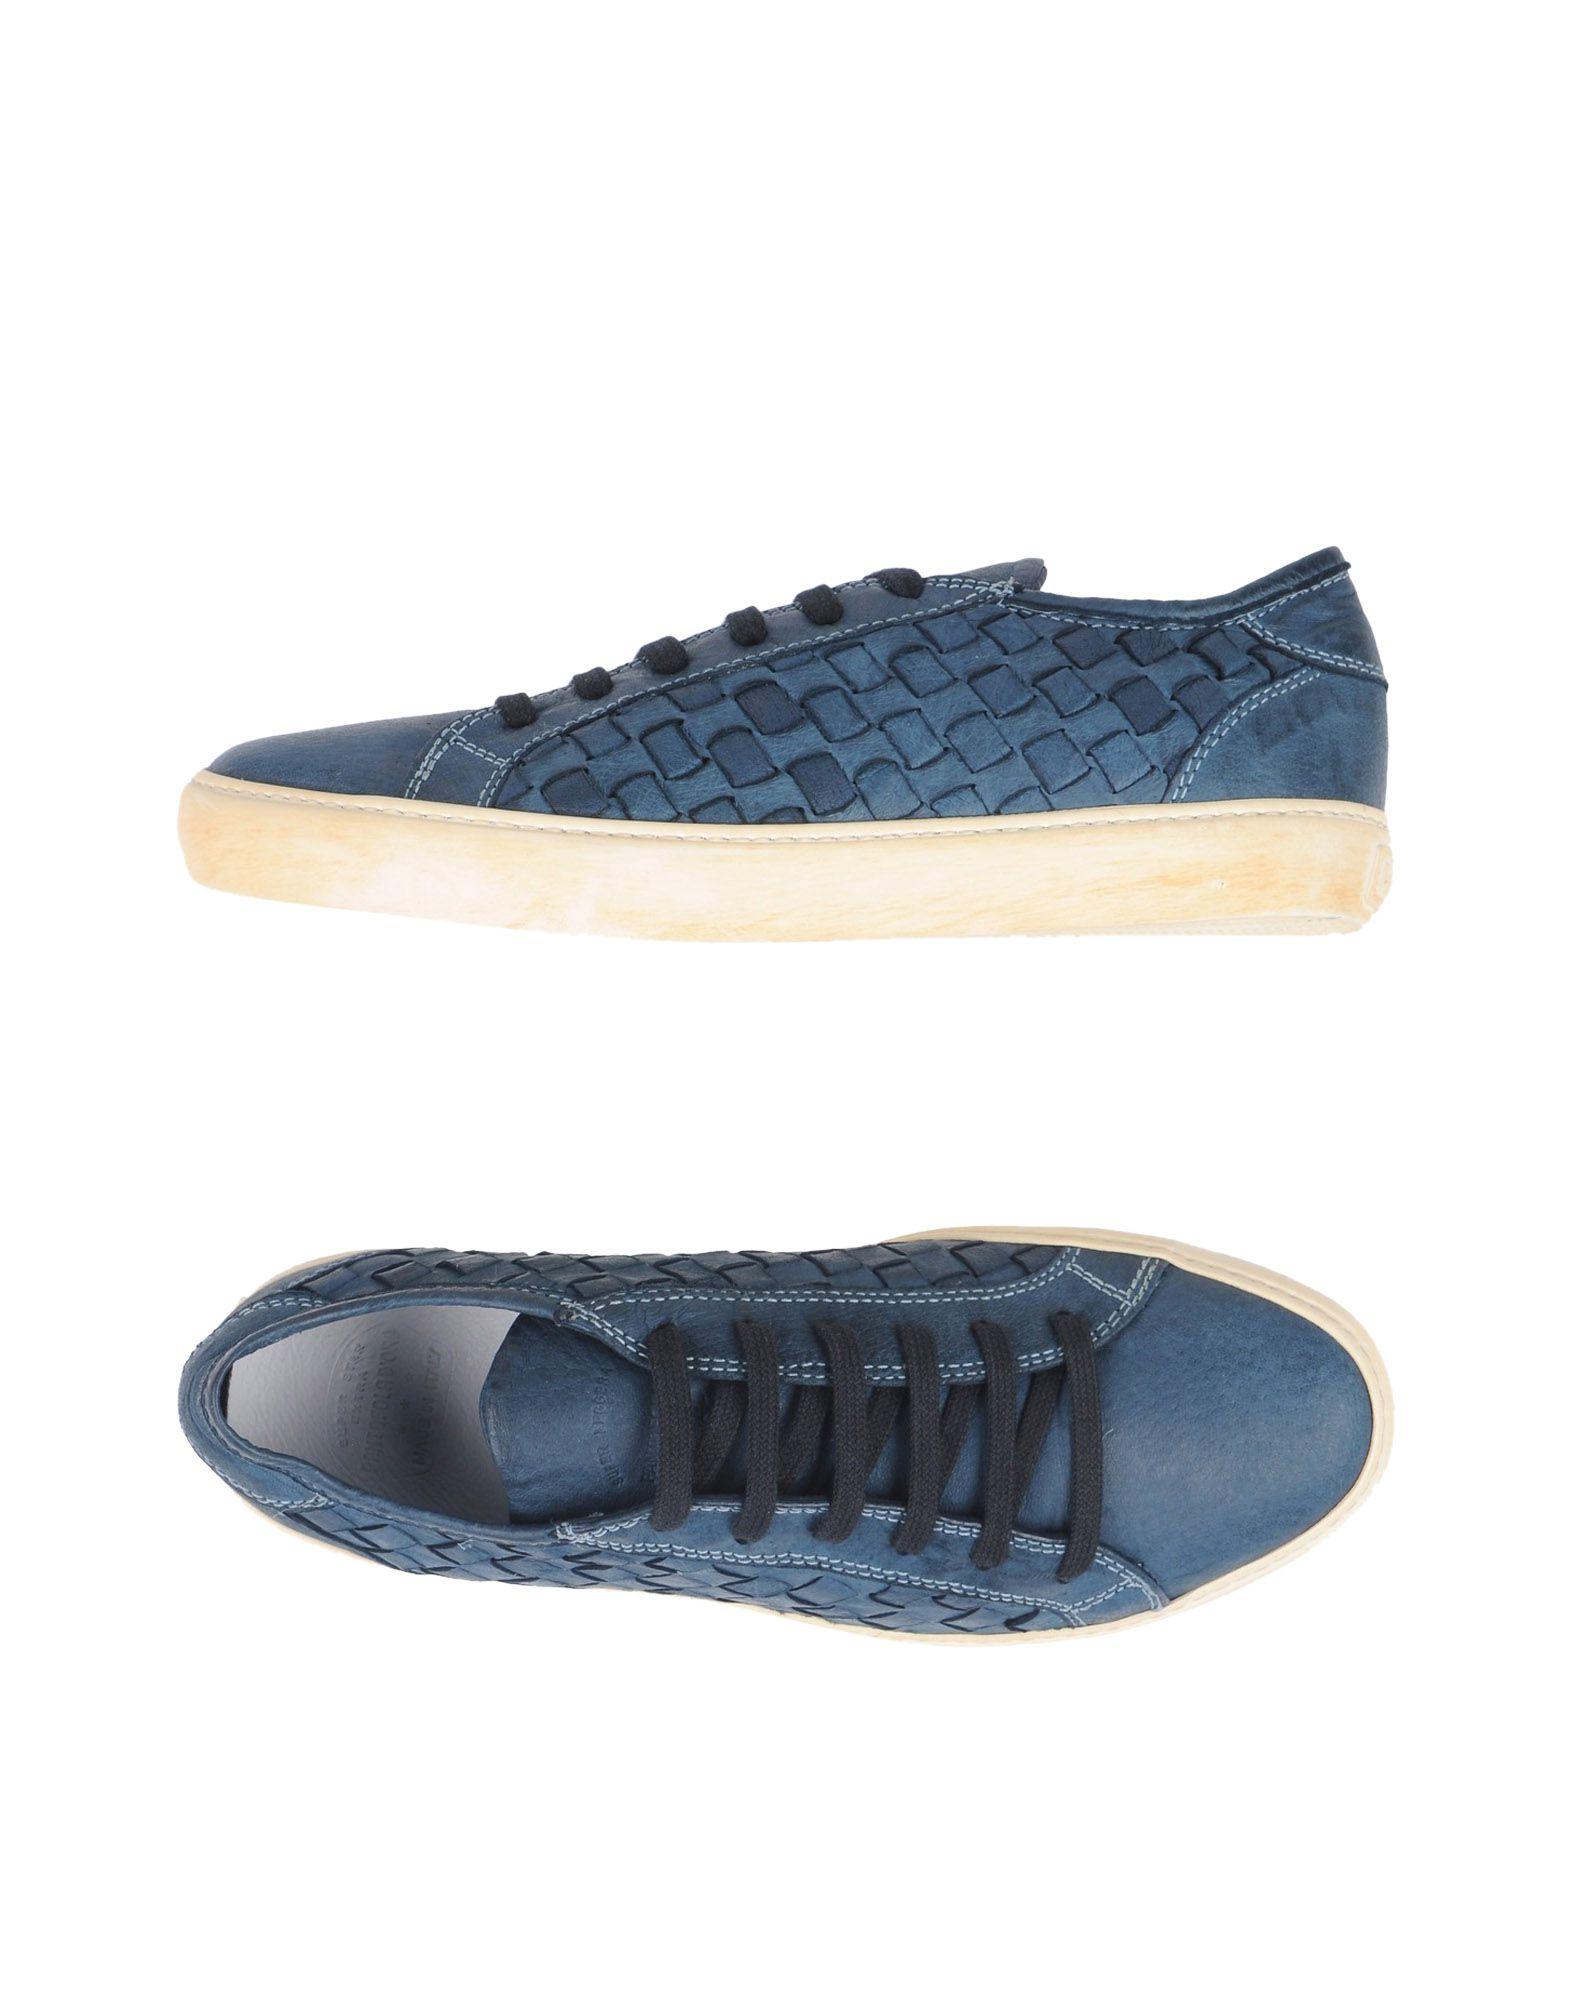 Pantofola D'oro Sneakers Damen  11353892JJ Gute Qualität beliebte Schuhe